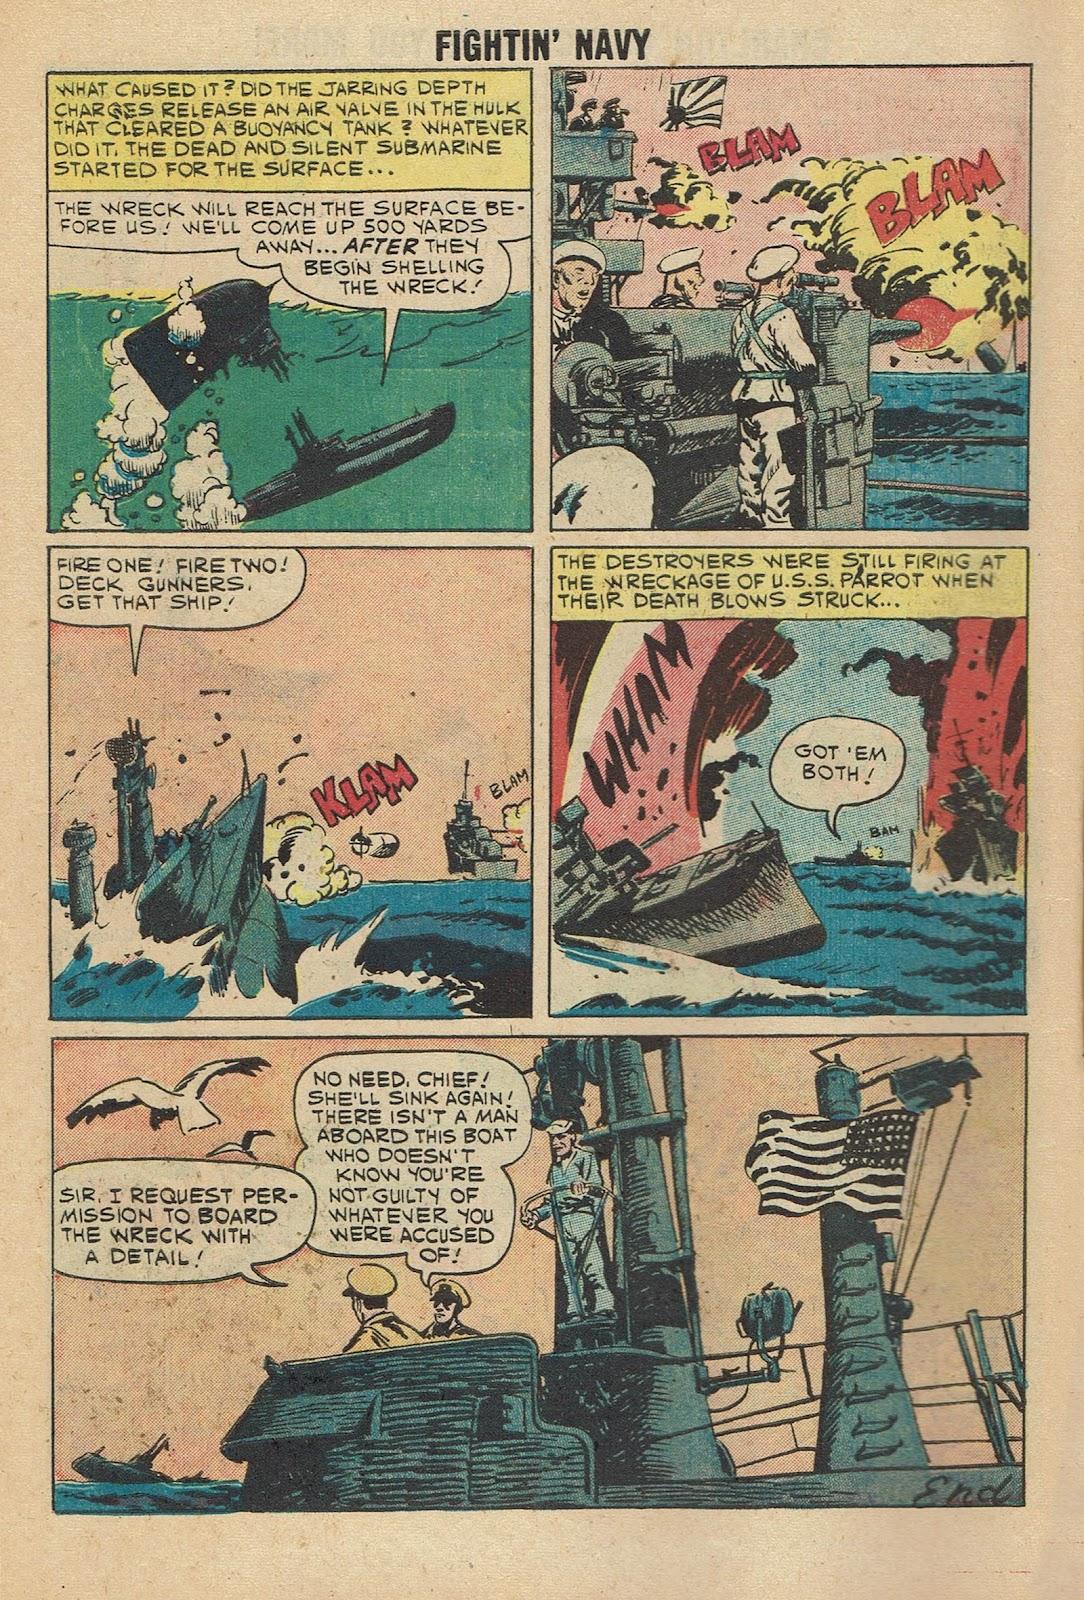 Read online Fightin' Navy comic -  Issue #96 - 10